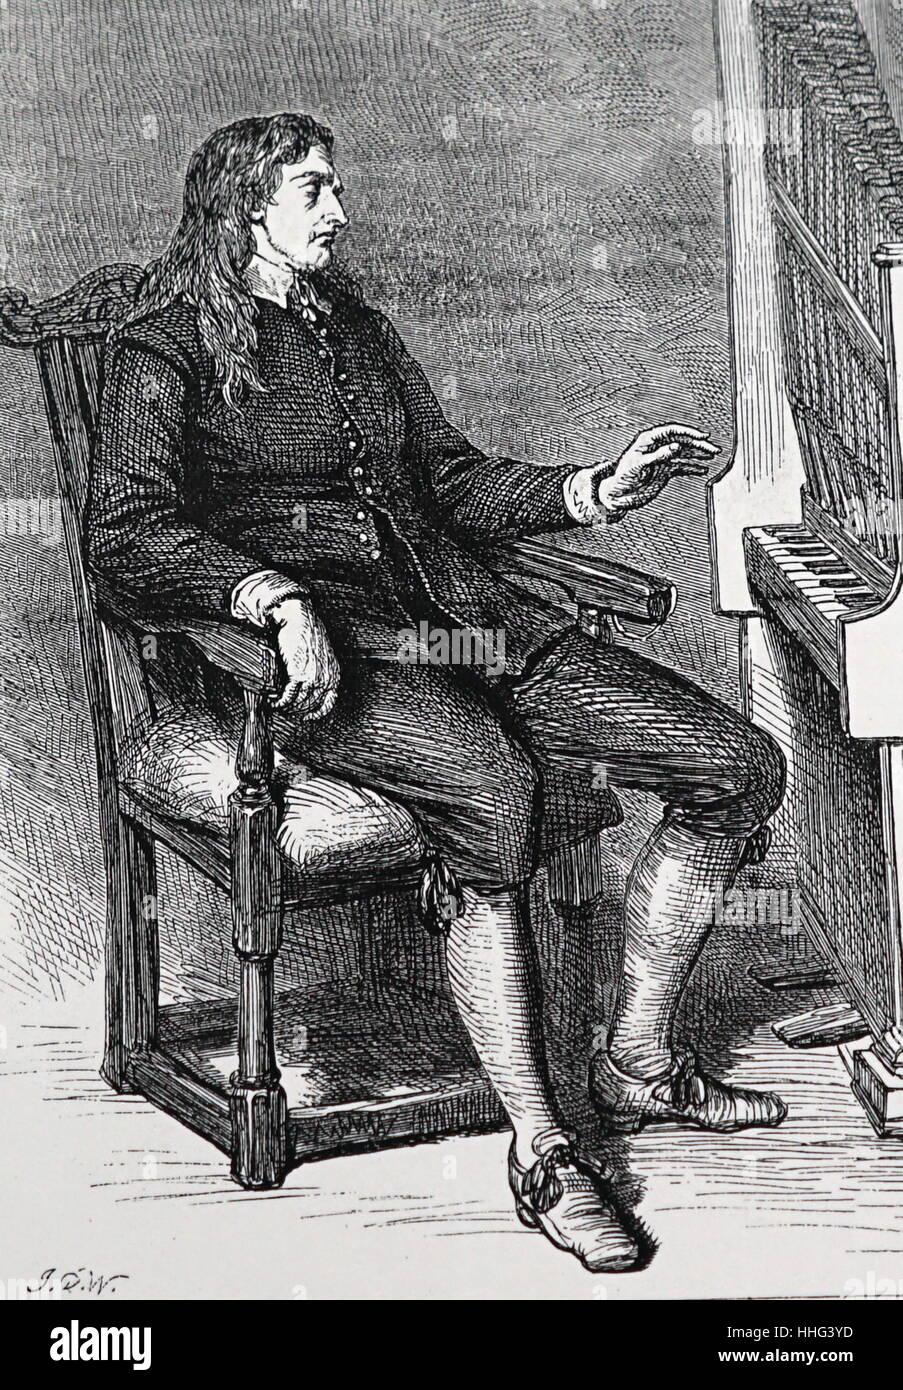 Portrait of John Milton - Stock Image